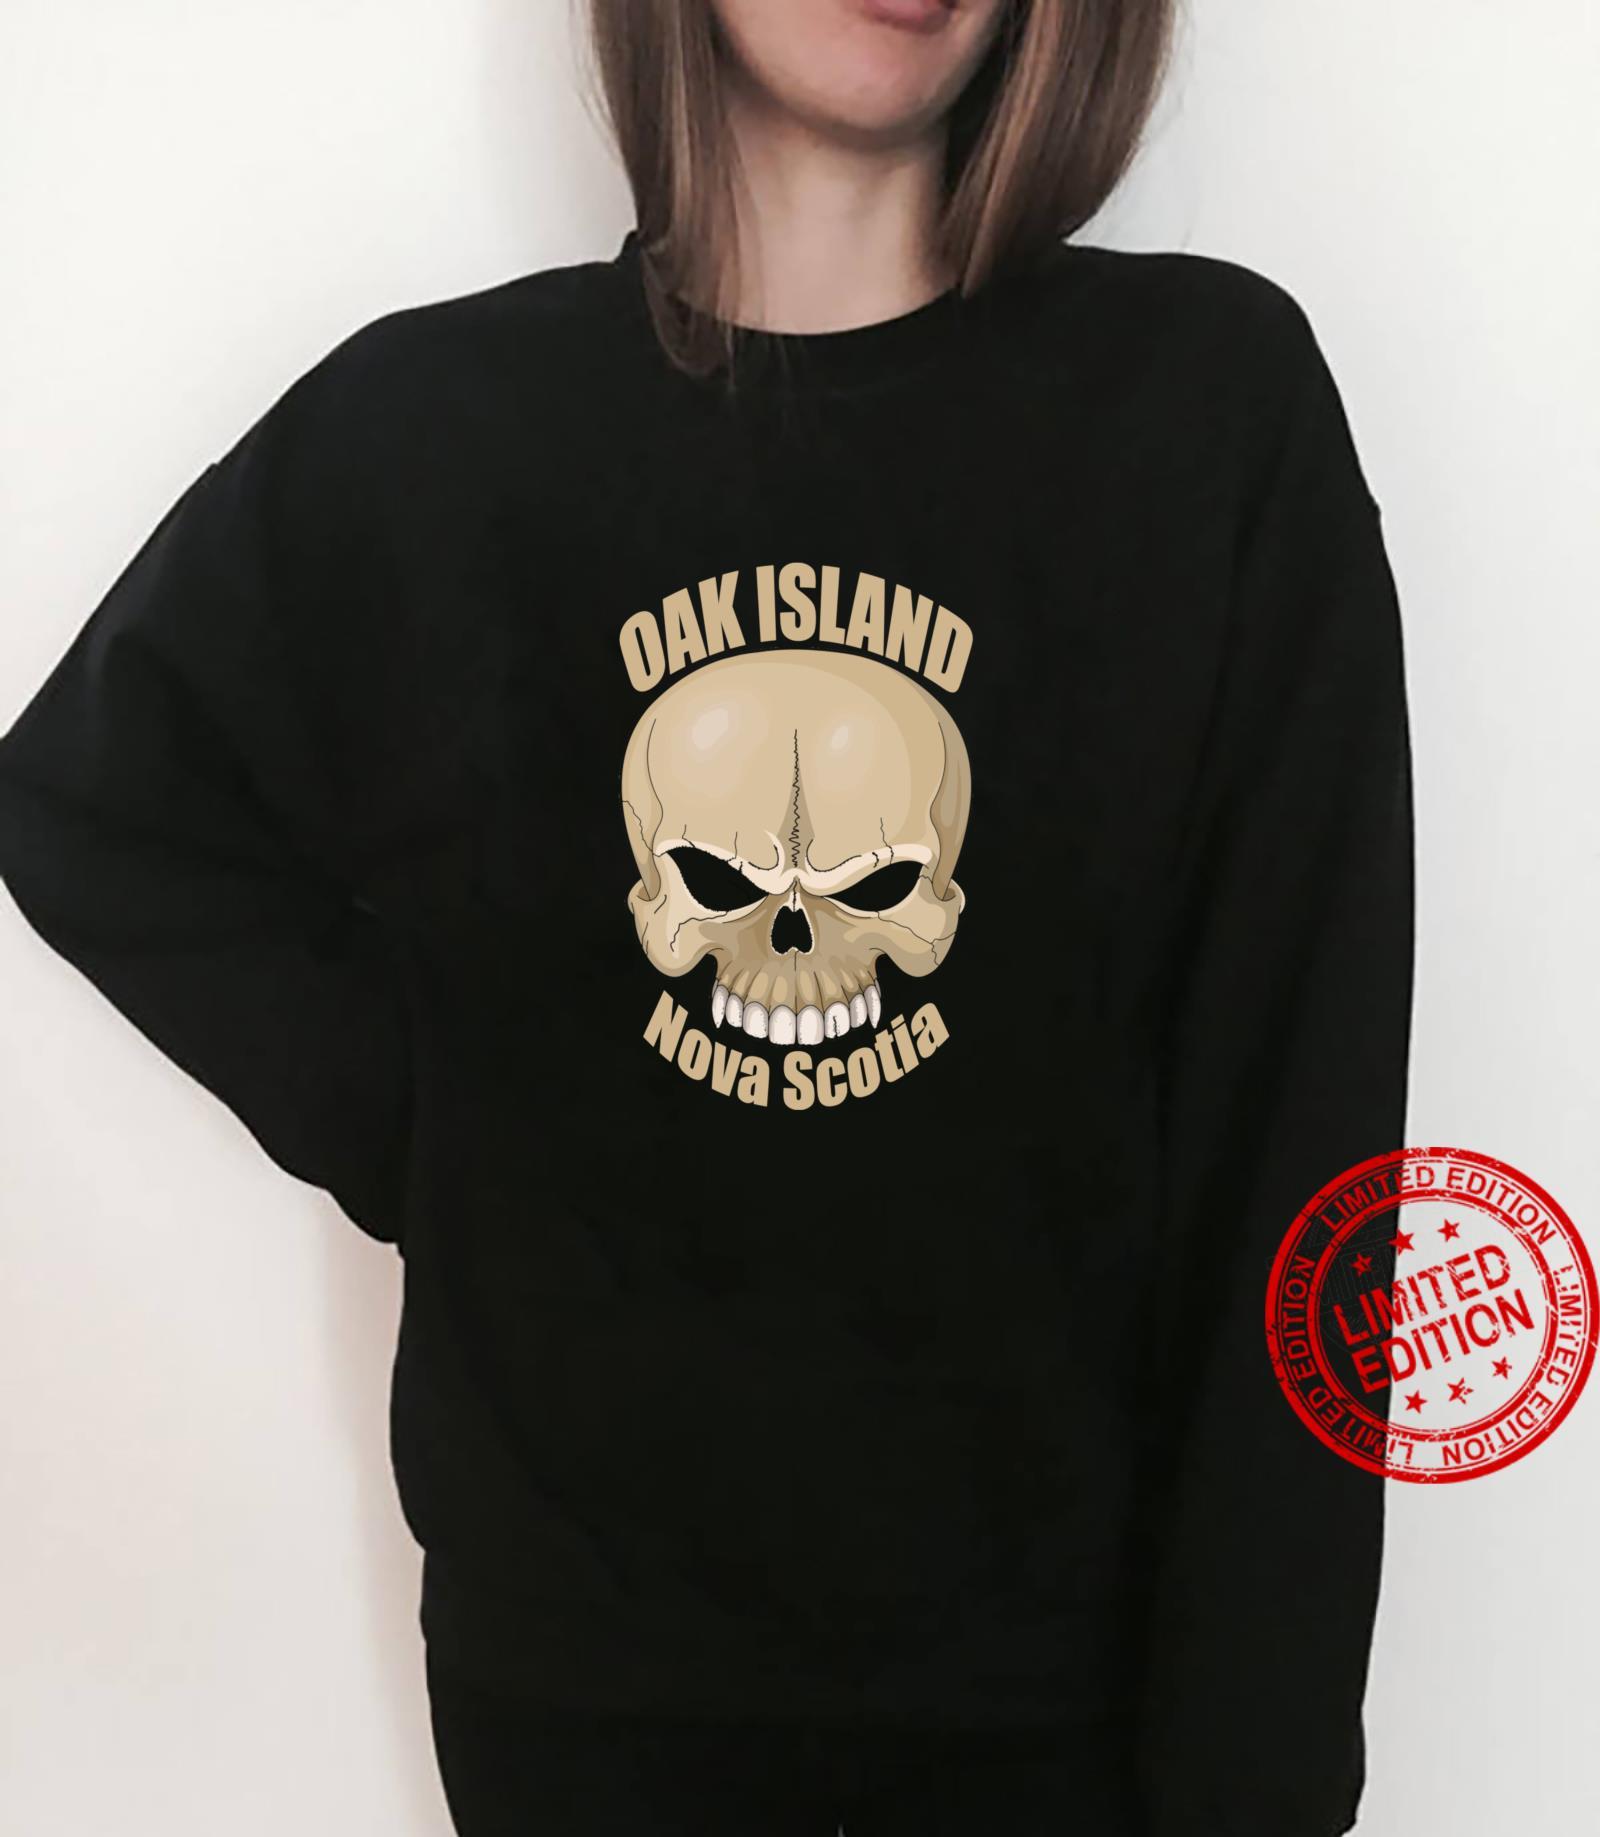 Oak Island Treasure Hunters Skull Nova Scotia Mystery Shirt sweater